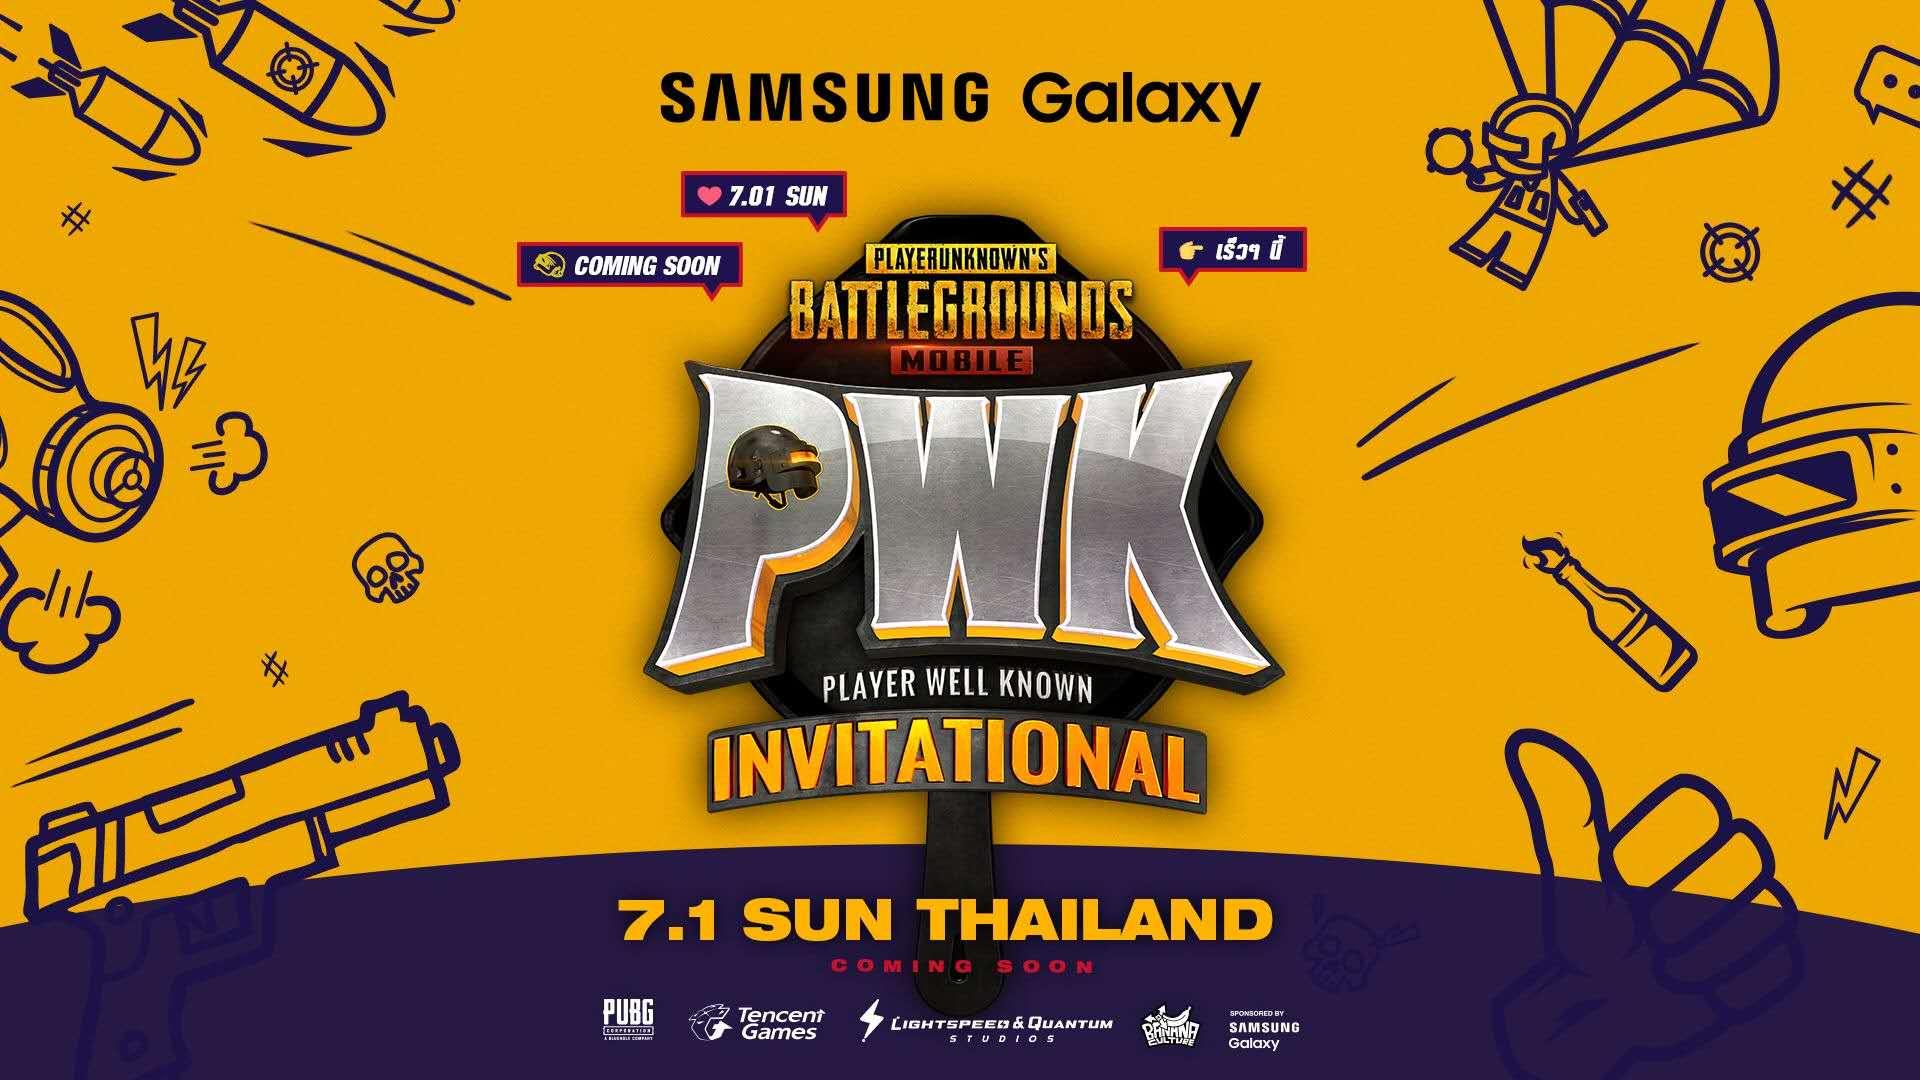 PWK Invitational 2962018